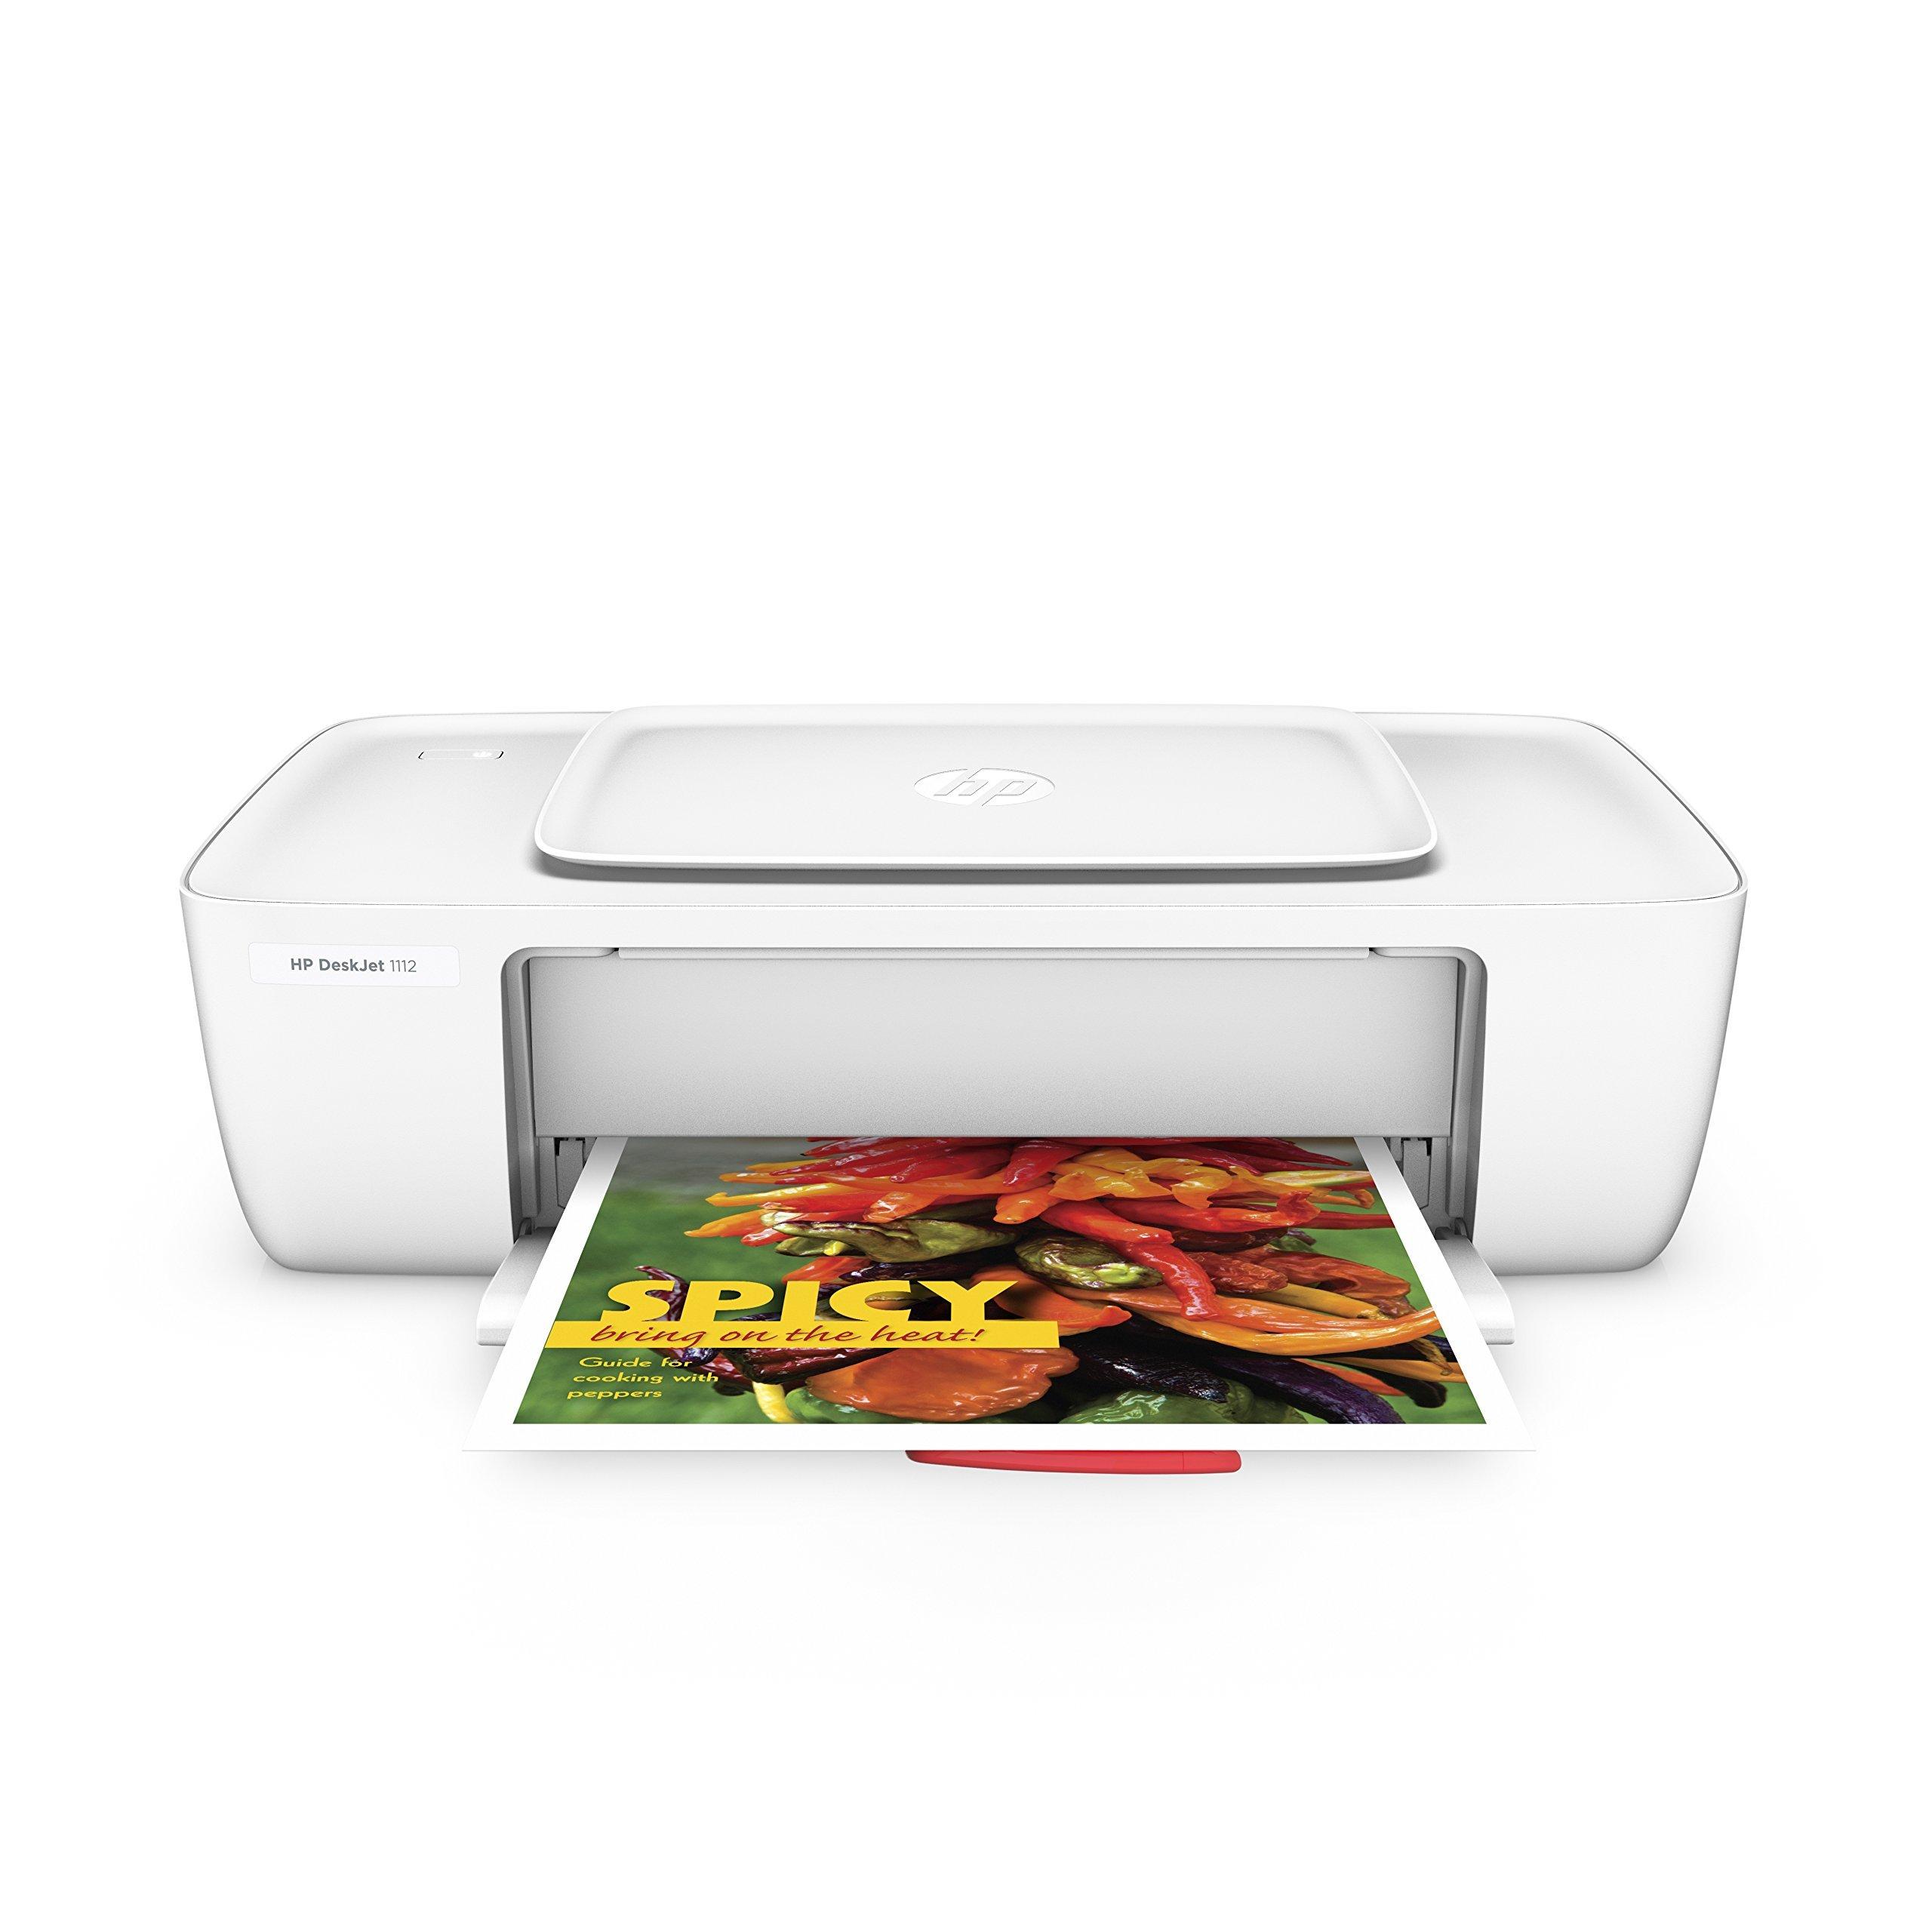 HP DeskJet 1112 Compact Printer (F5S23A) (Renewed)